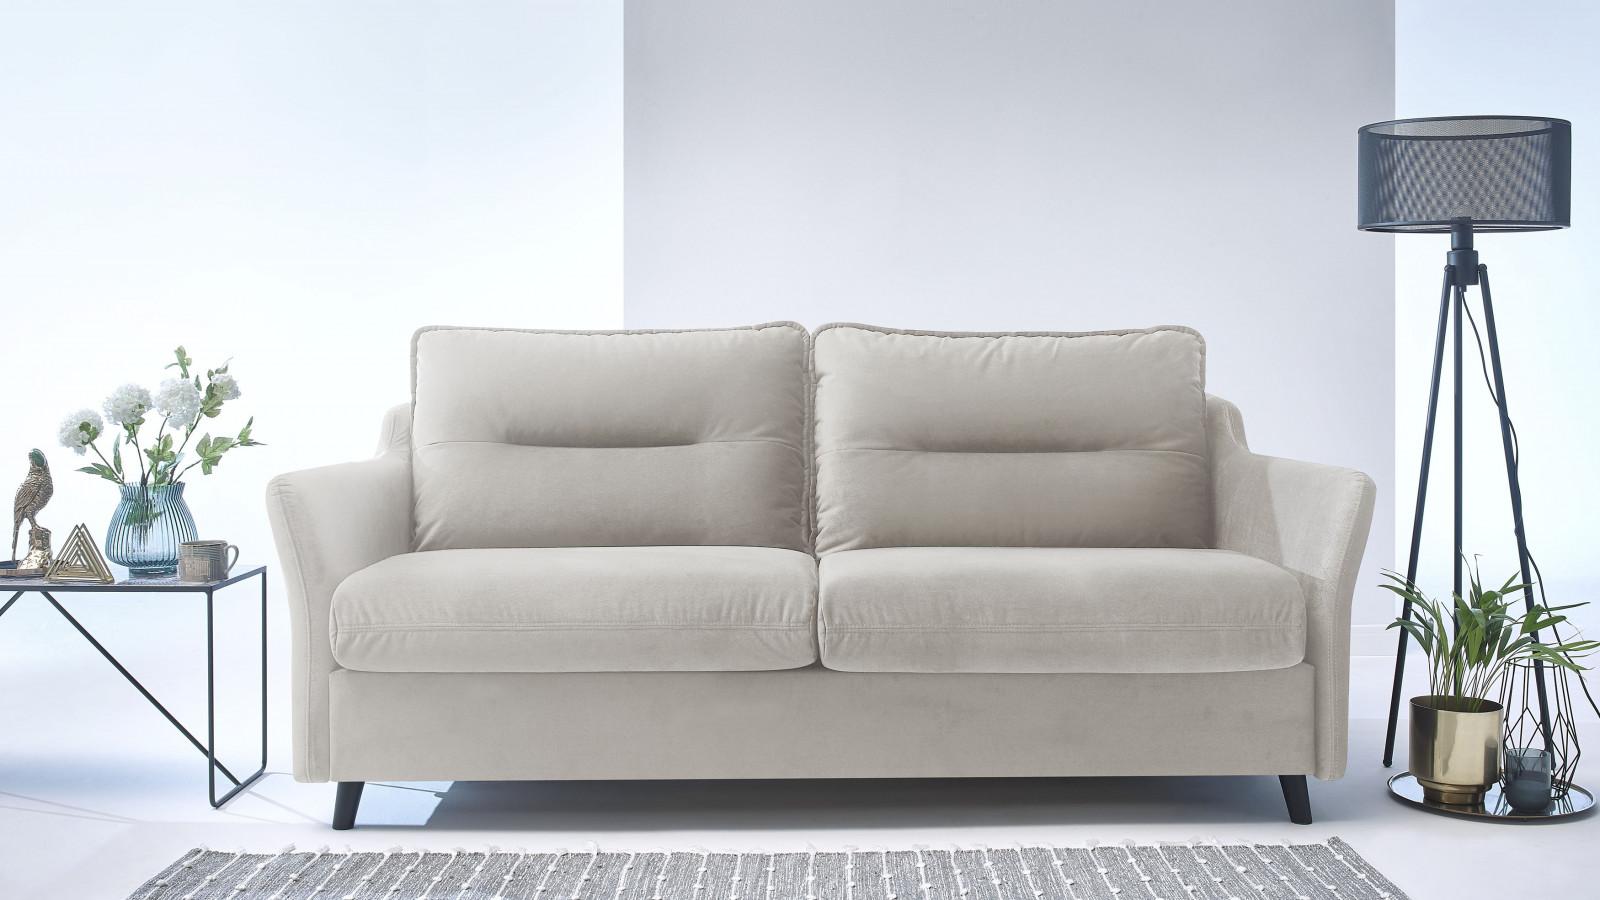 Peachy Sofa Right Convertible Opening Express Loft Bobochic Dailytribune Chair Design For Home Dailytribuneorg